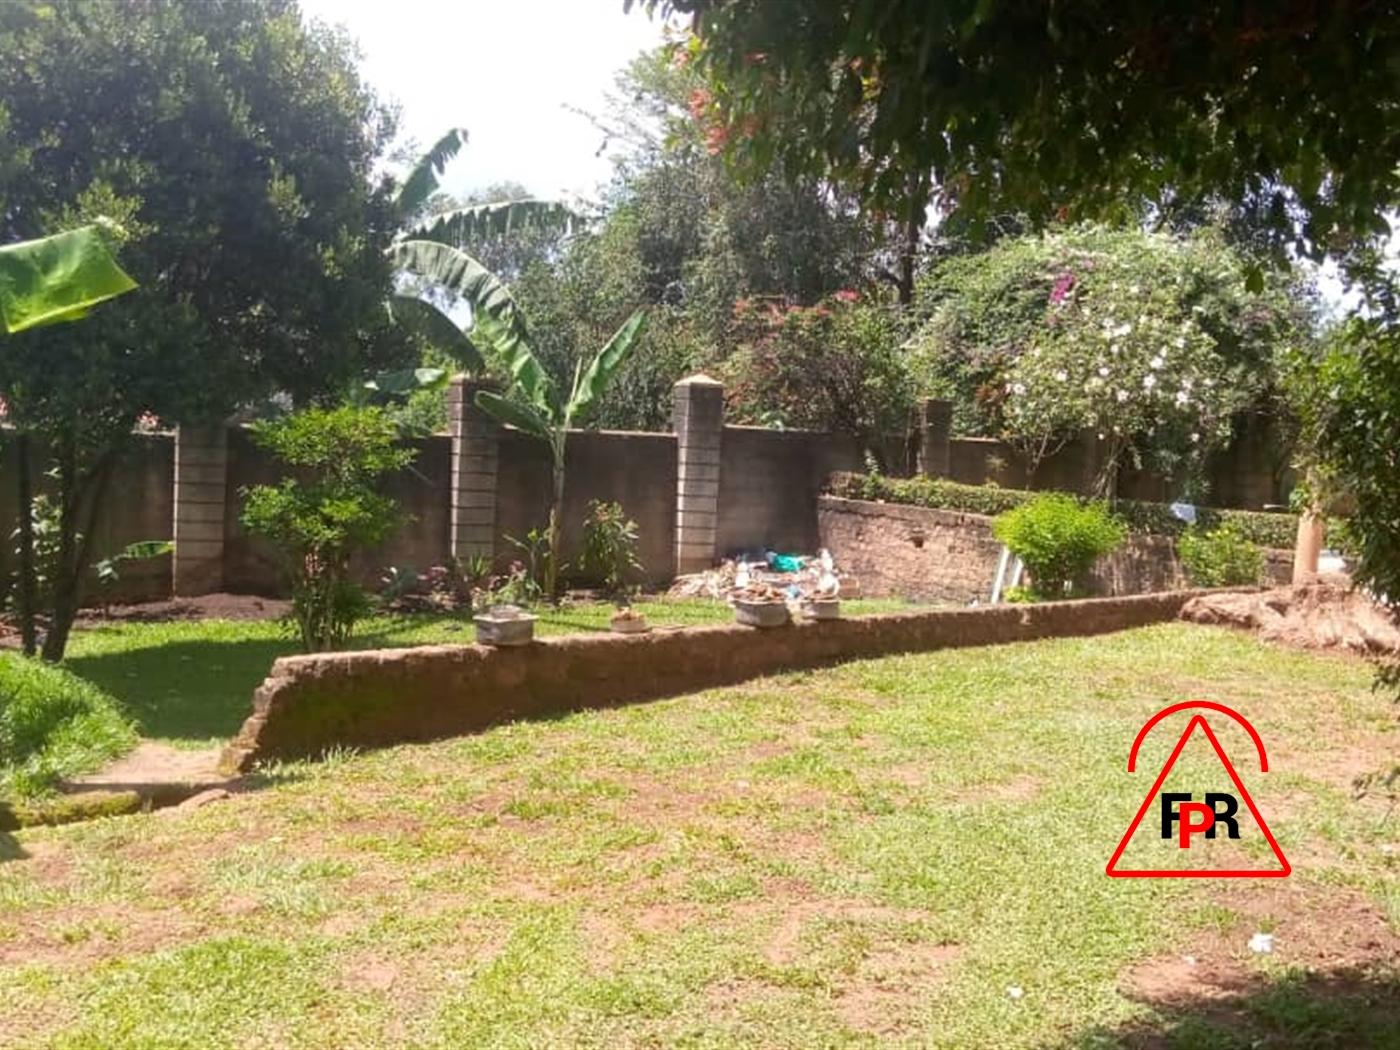 Storeyed house for sale in Kiwatuule Kampala